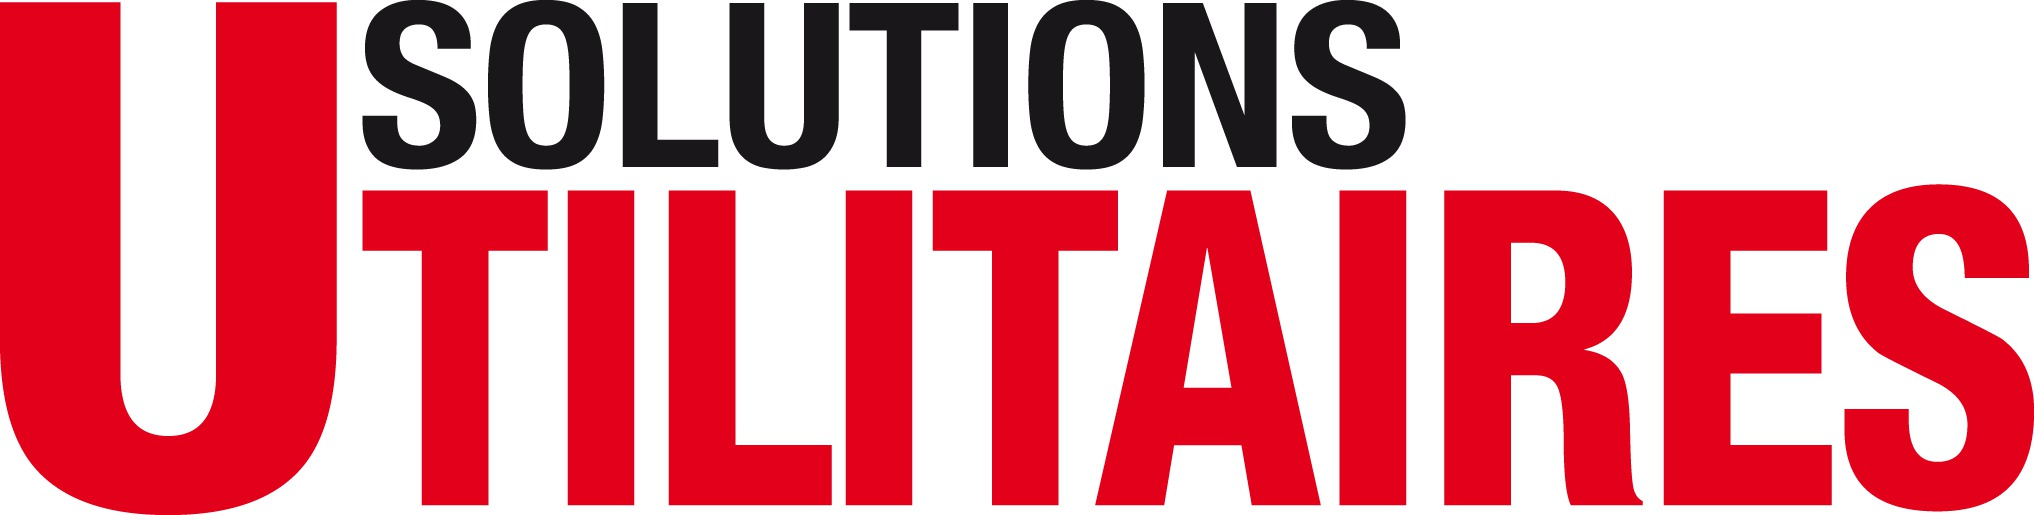 solutions utilitaires logo